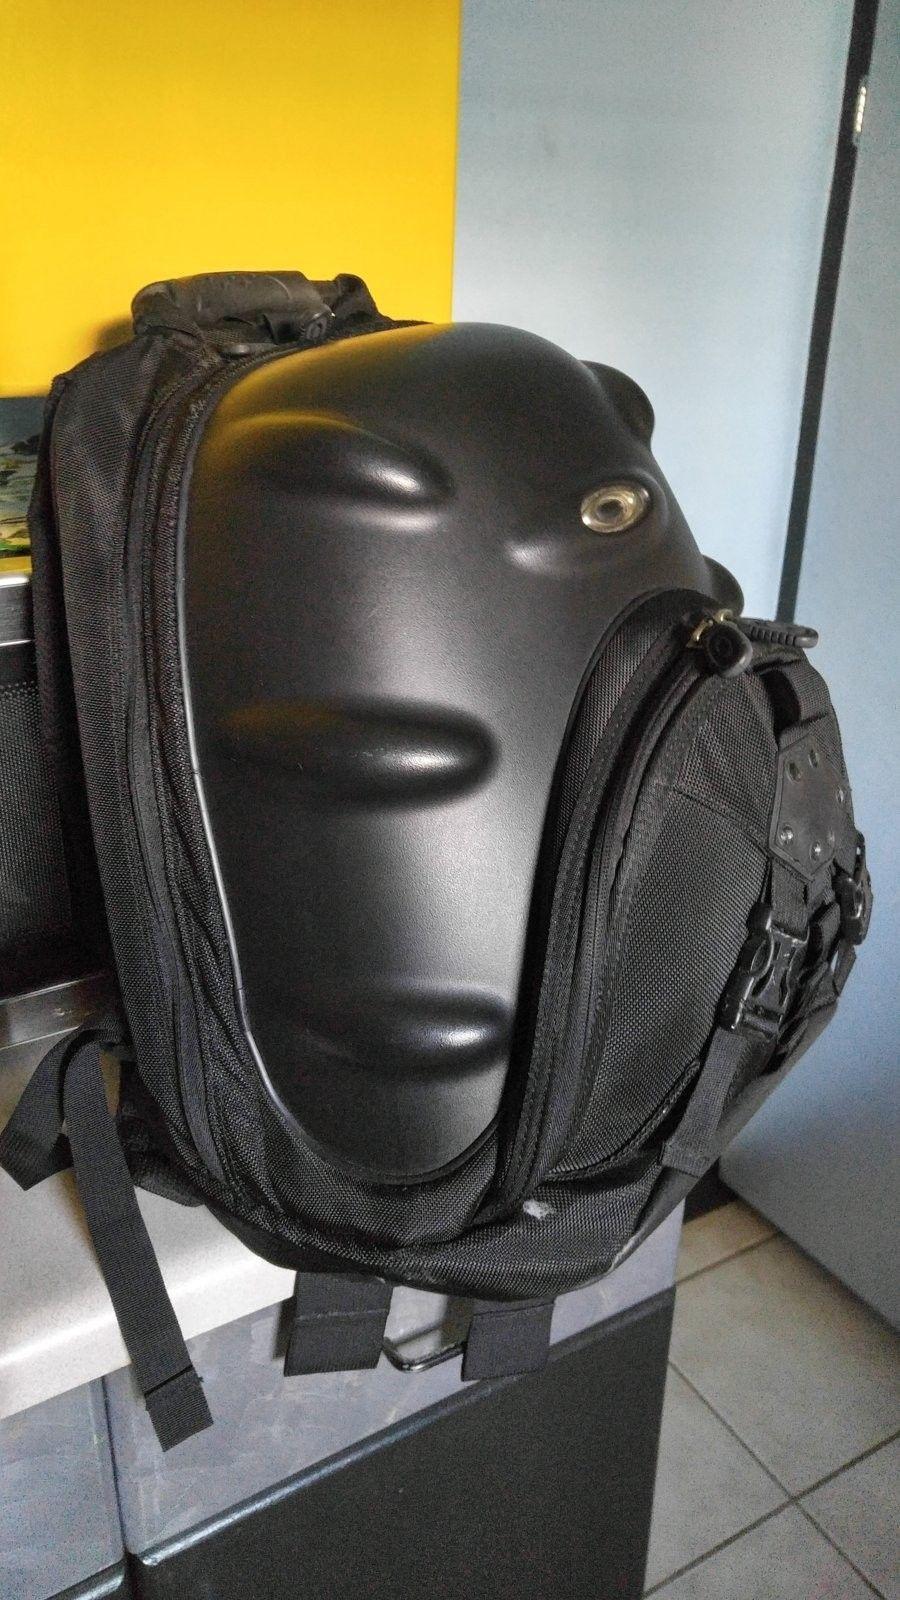 Oakley hard shell factory rep bag... - 20160226_164737_HDR.jpg